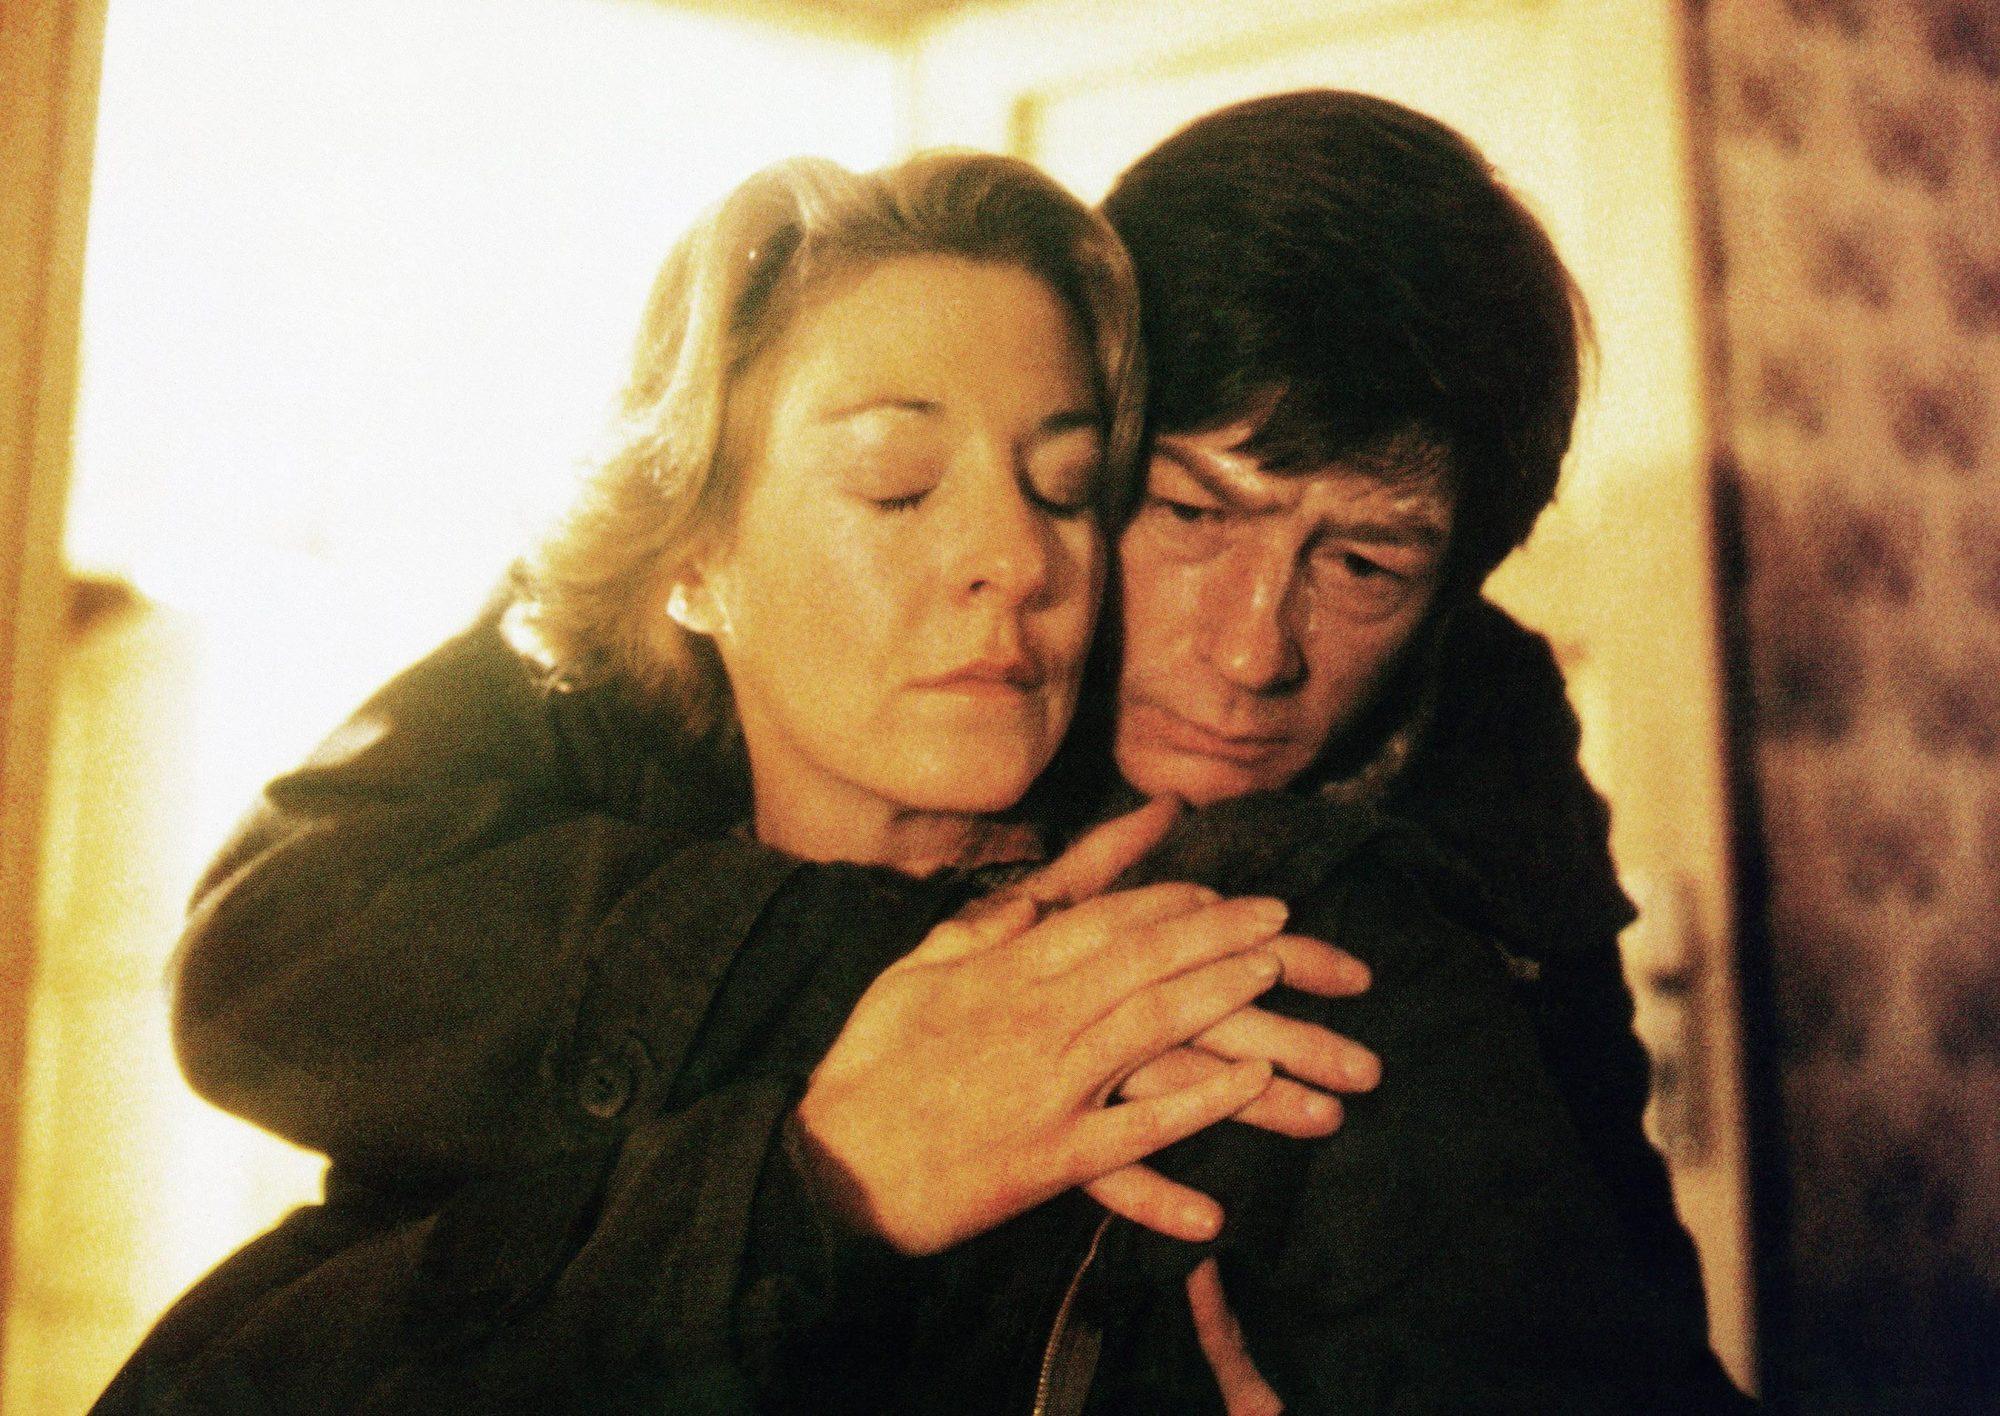 NIGHT CROSSING, from left: Jane Alexander, John Hurt, 1982, © Buena Vista/courtesy Everett Collectio